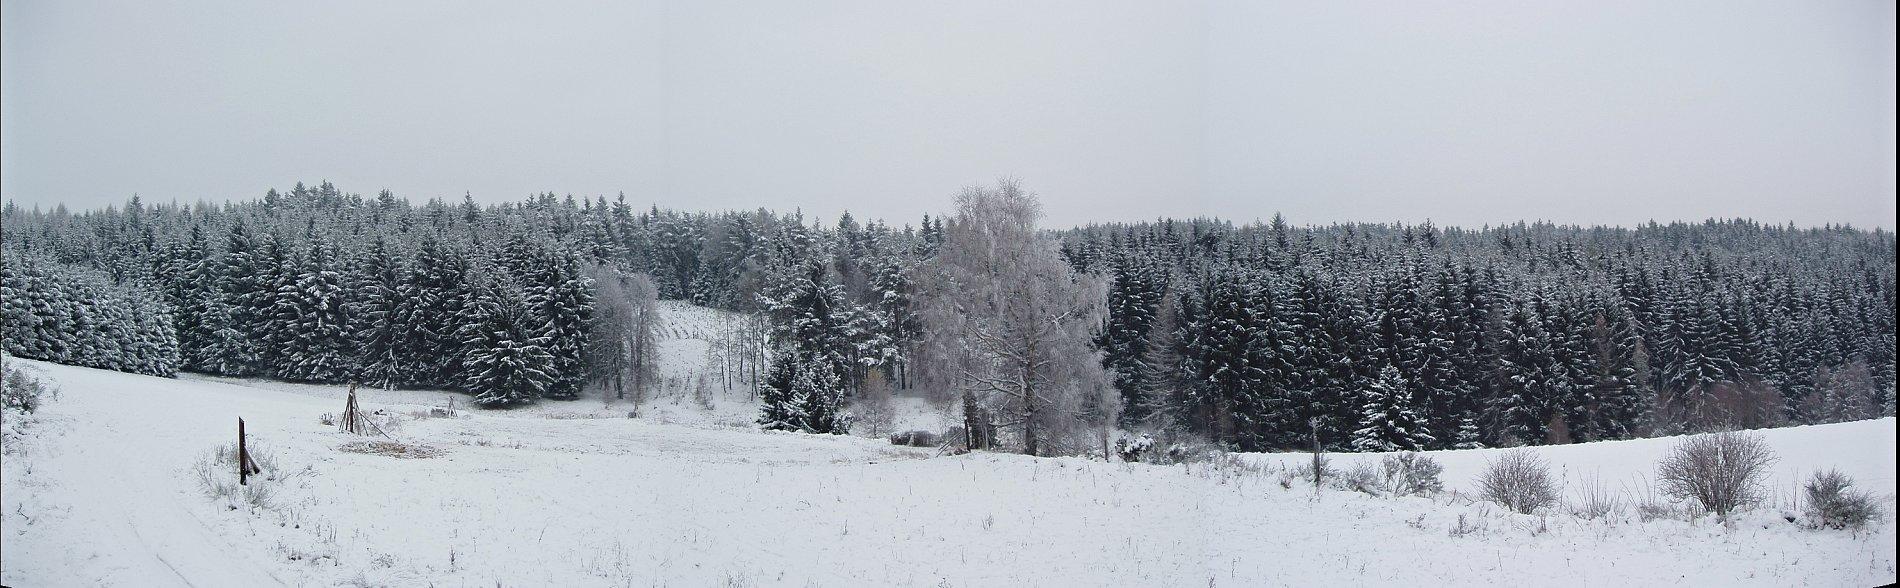 Muffel im Schnee